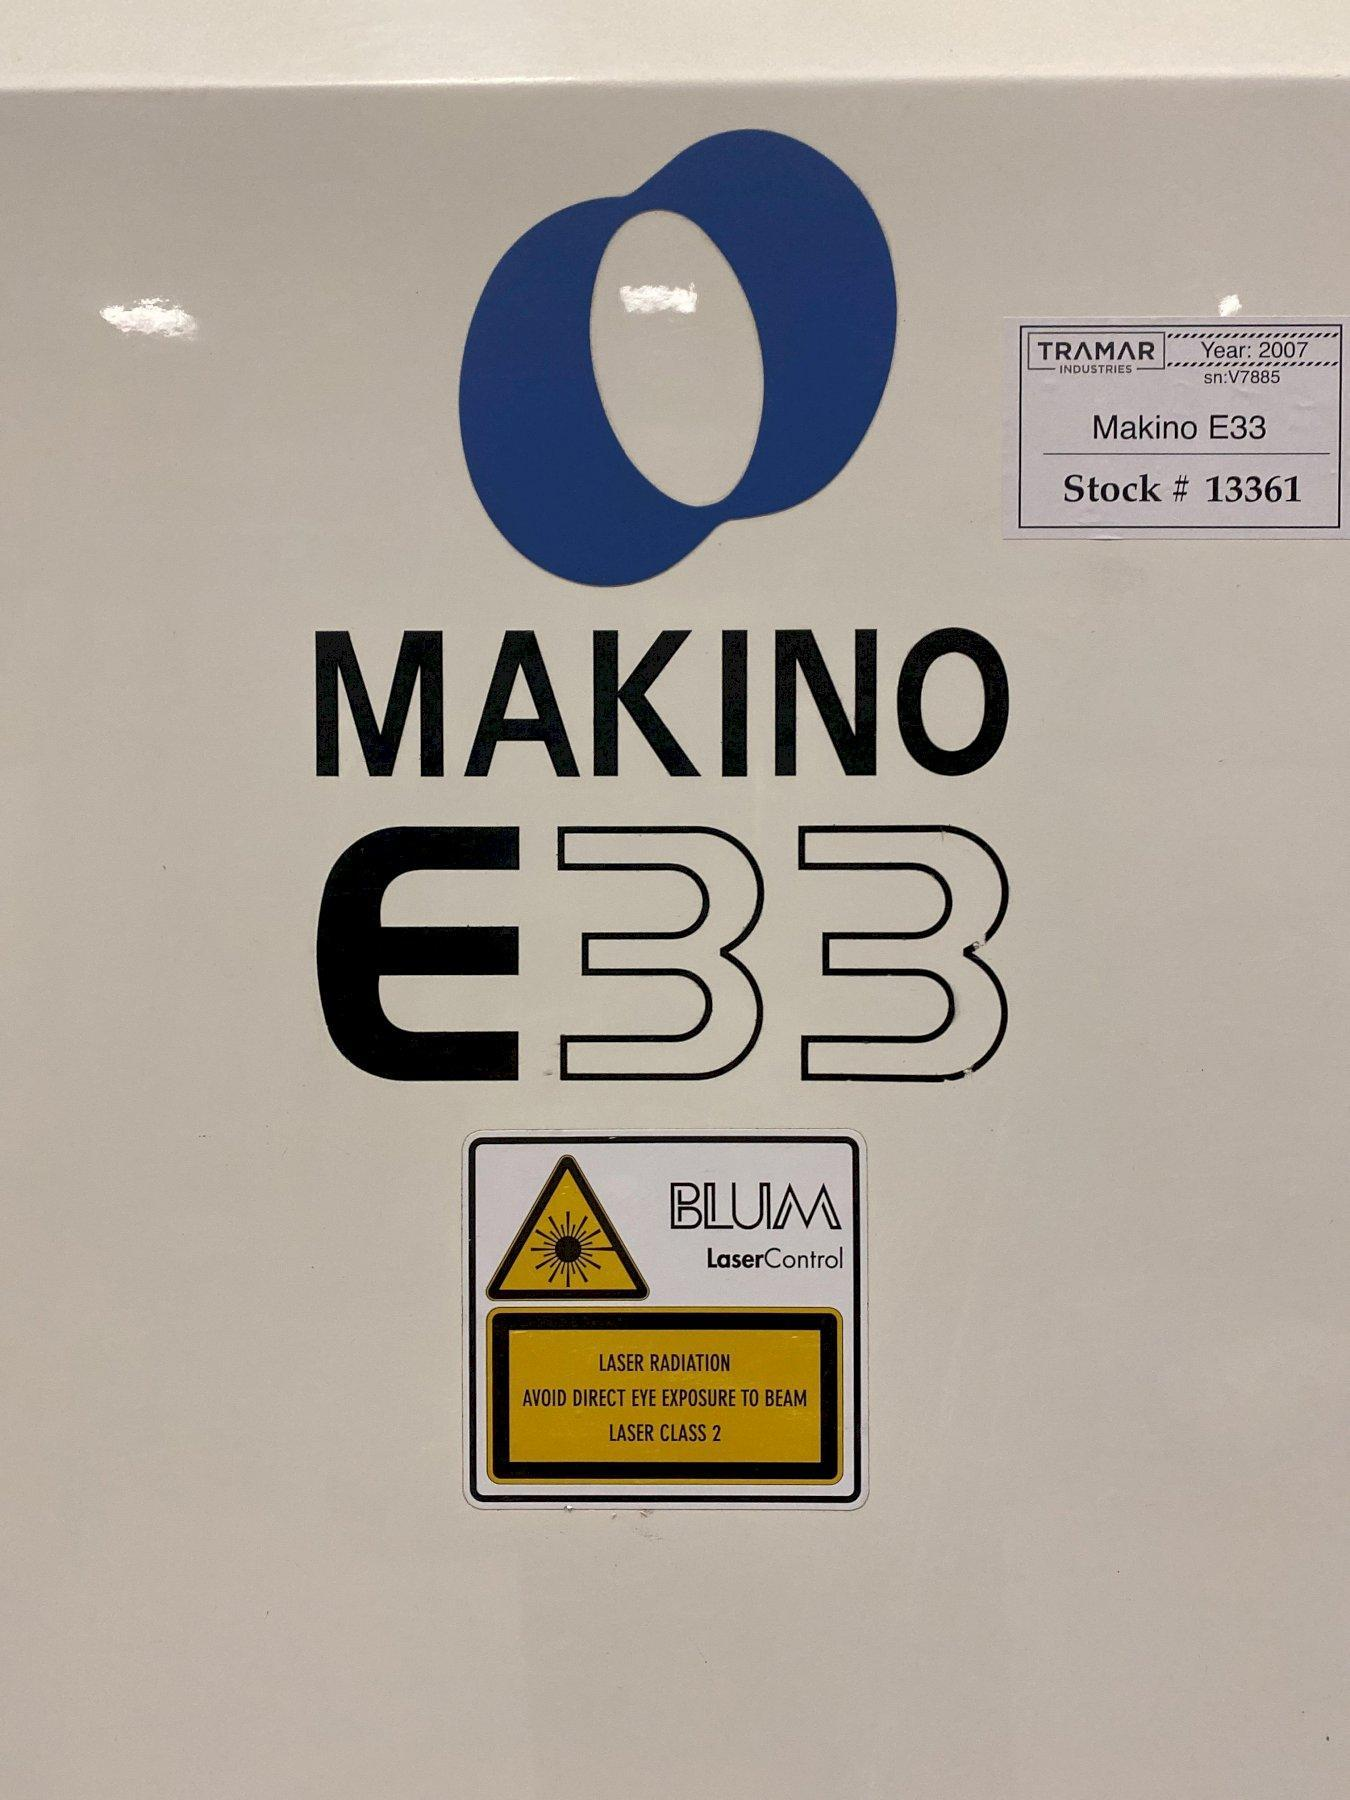 Makino E33 CNC Vertical Machining Center - 2007